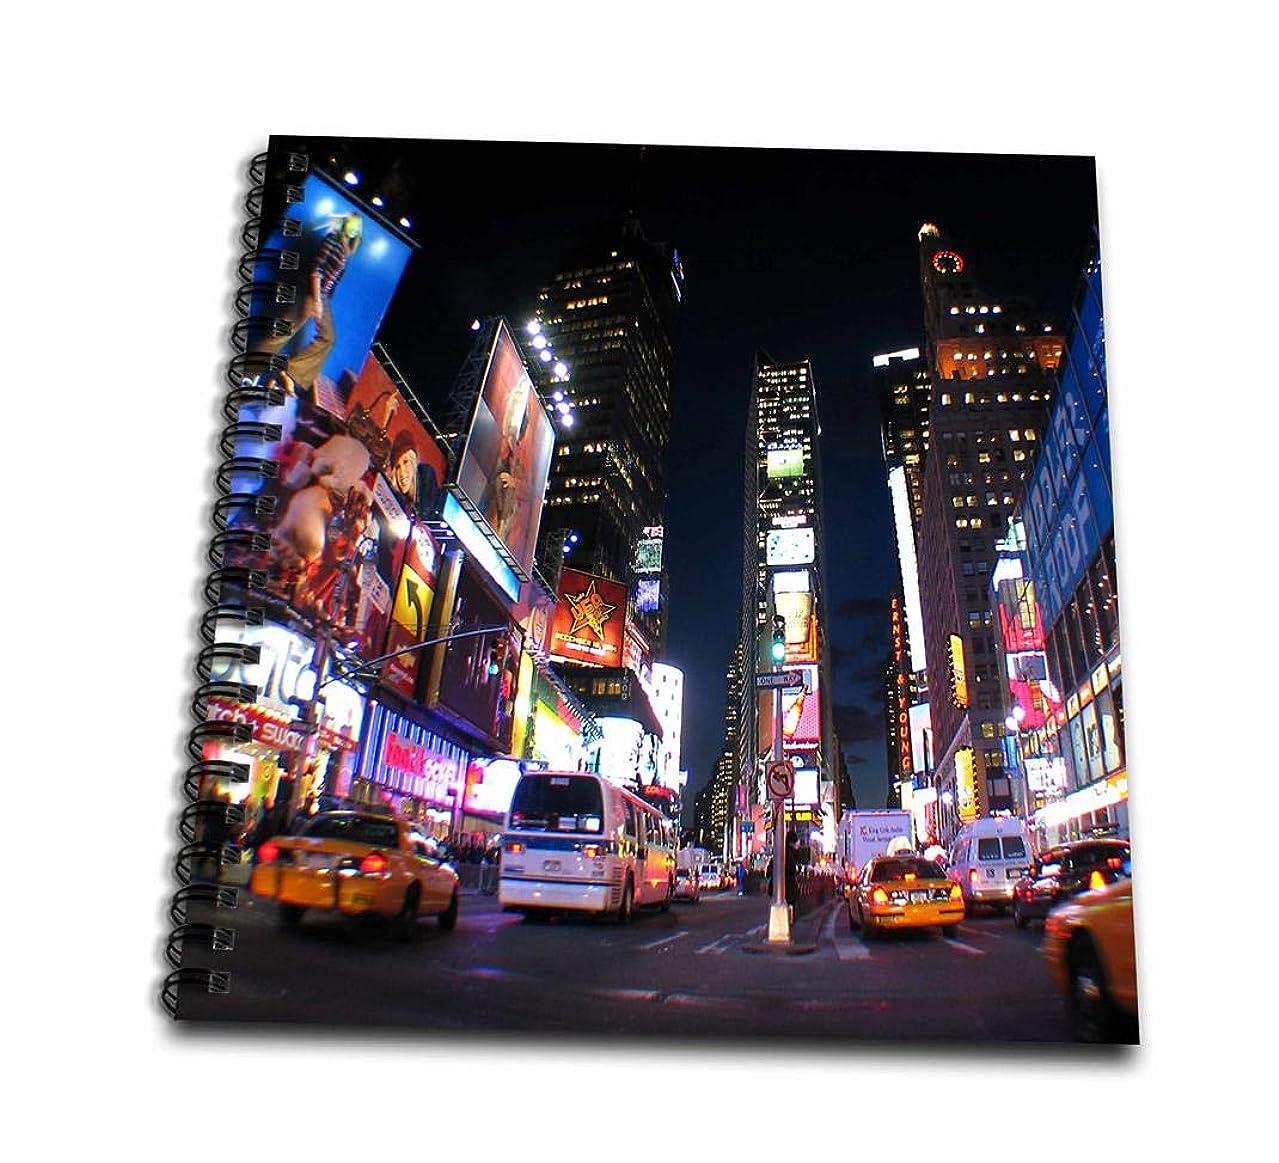 3dRose db_101408_2 New York at Night-Memory Book, 12 by 12